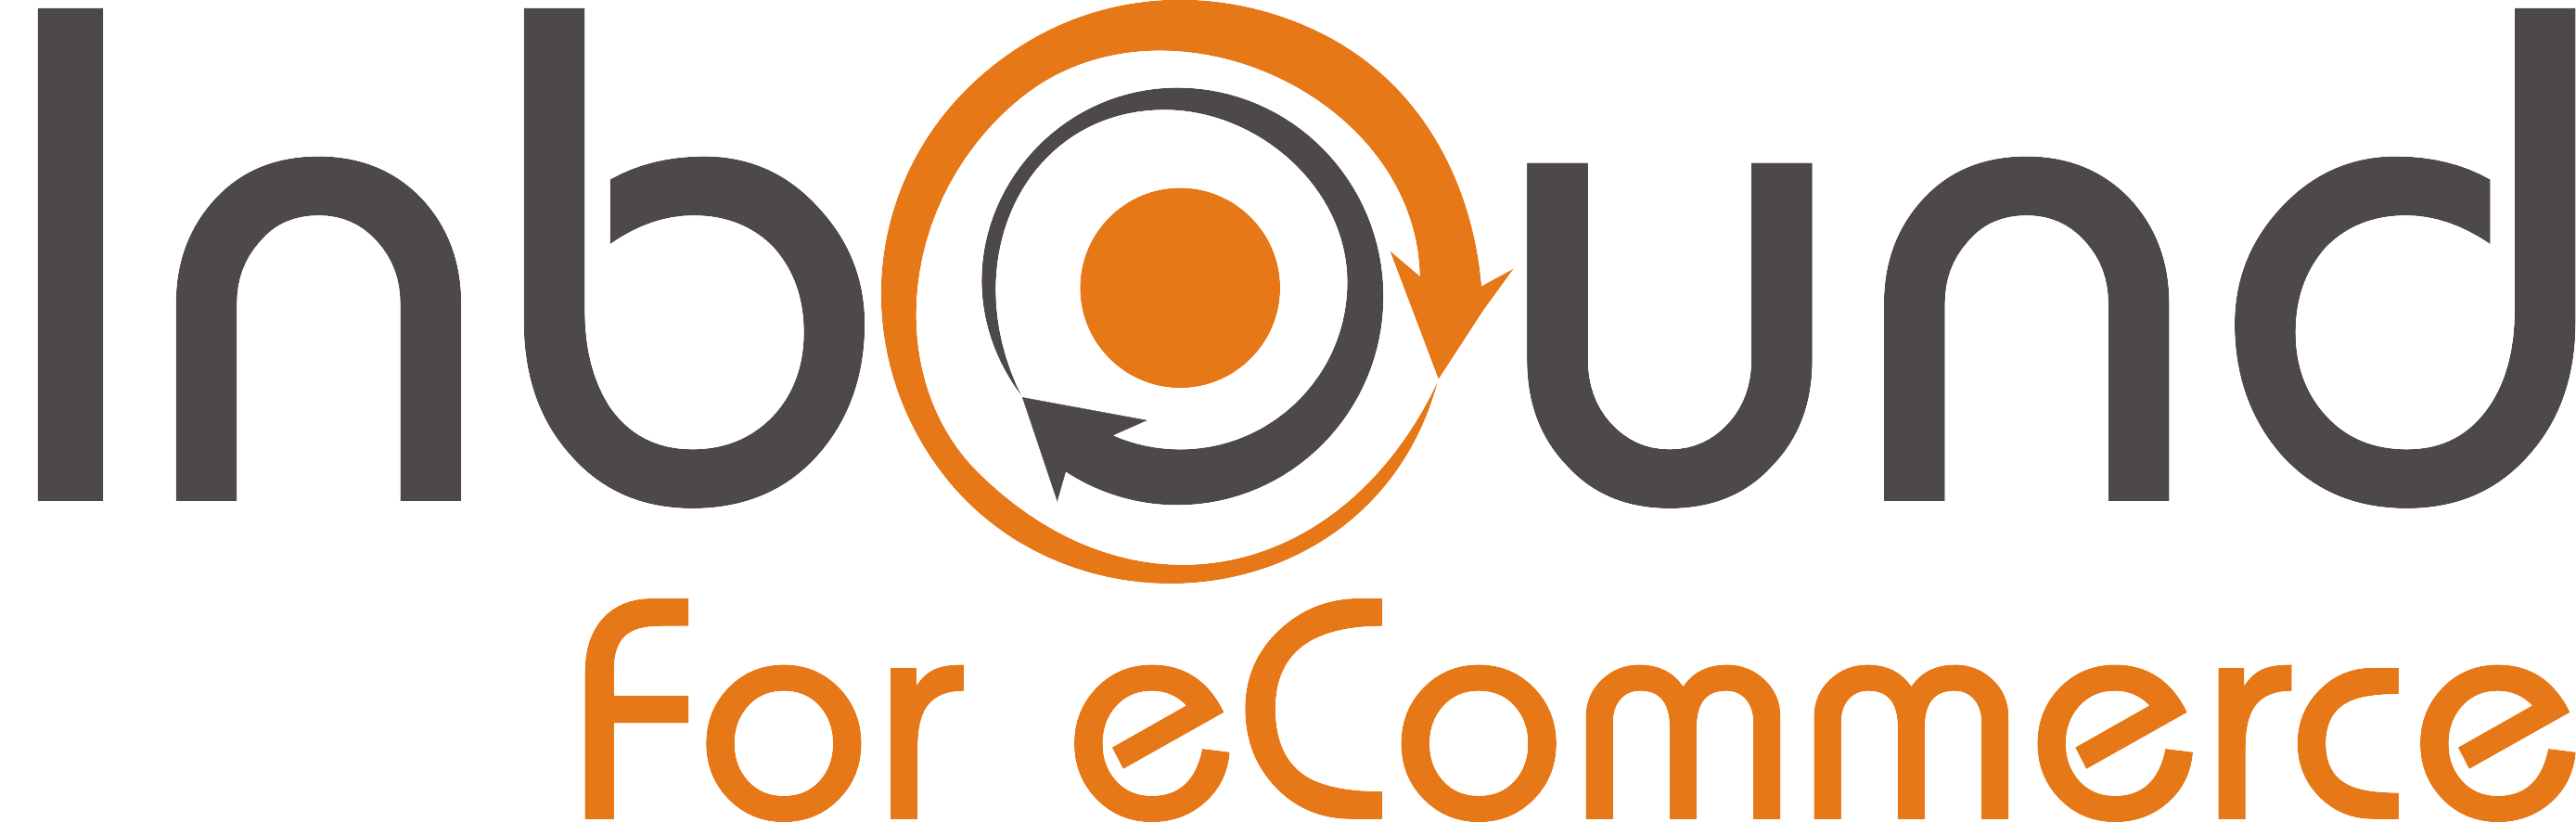 Inbound for ECommerce